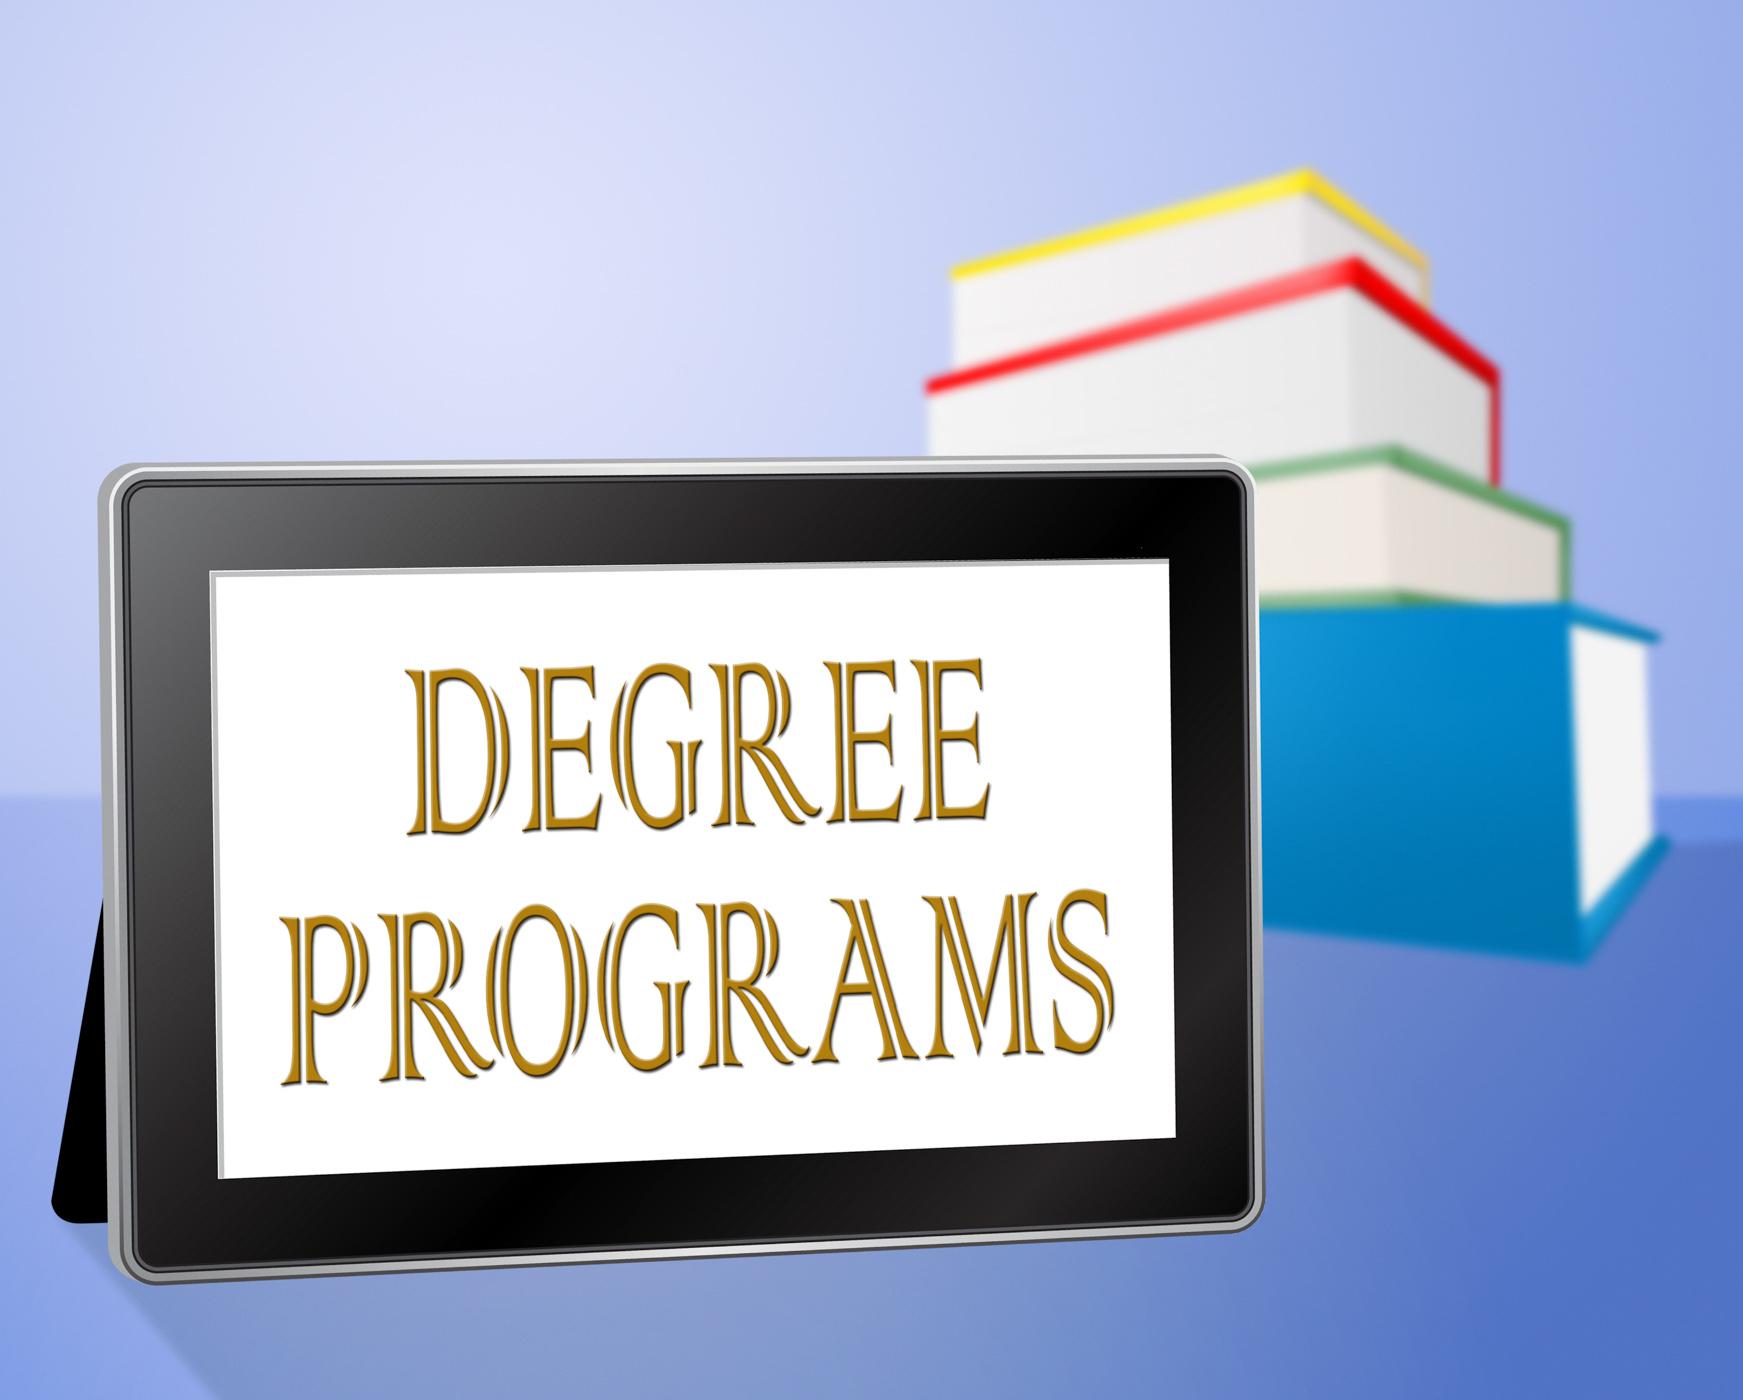 Degree programs represents books bachelors and internet photo